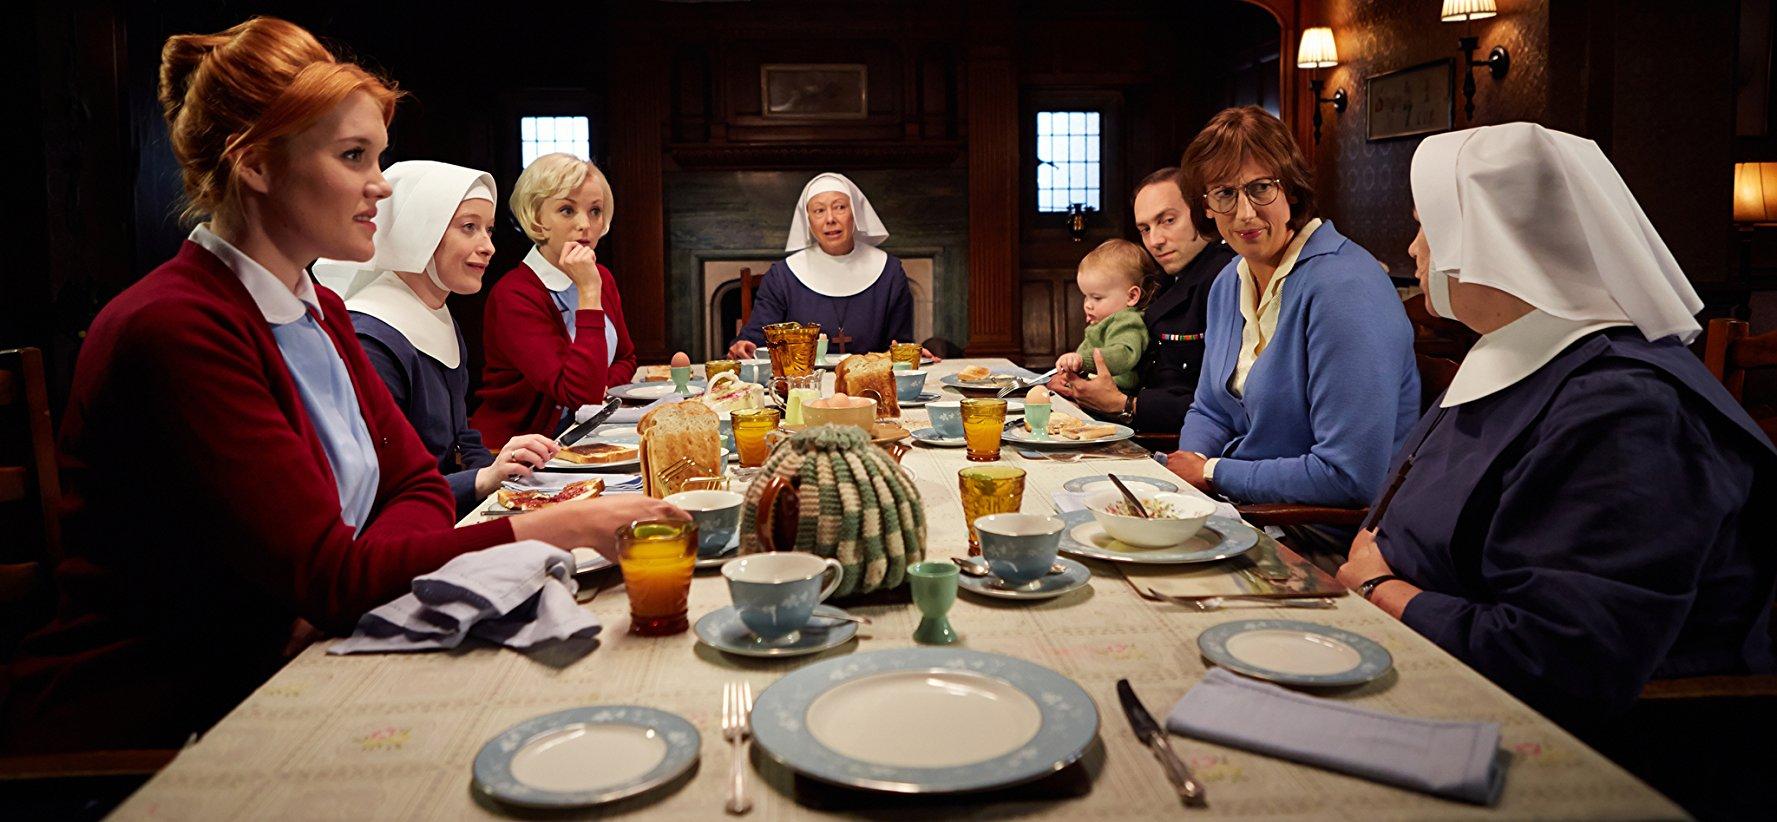 Call the Midwife - Season 7